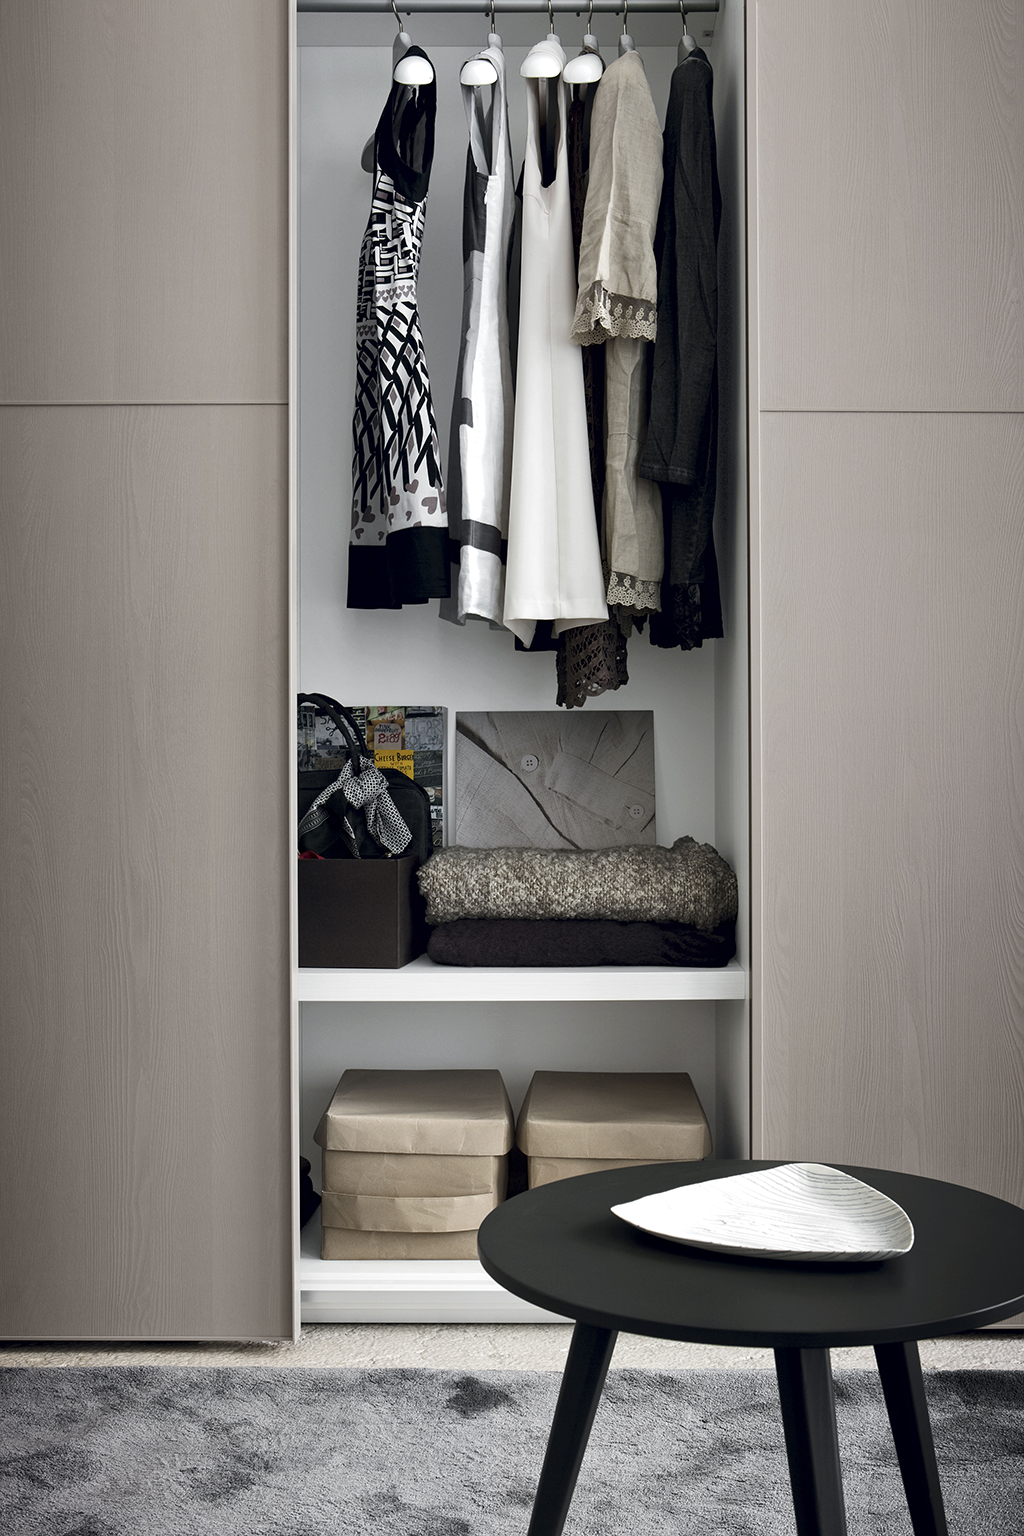 amore 016 fitted bedroom furniture wardrobes uk lawrence walsh furniture. Black Bedroom Furniture Sets. Home Design Ideas